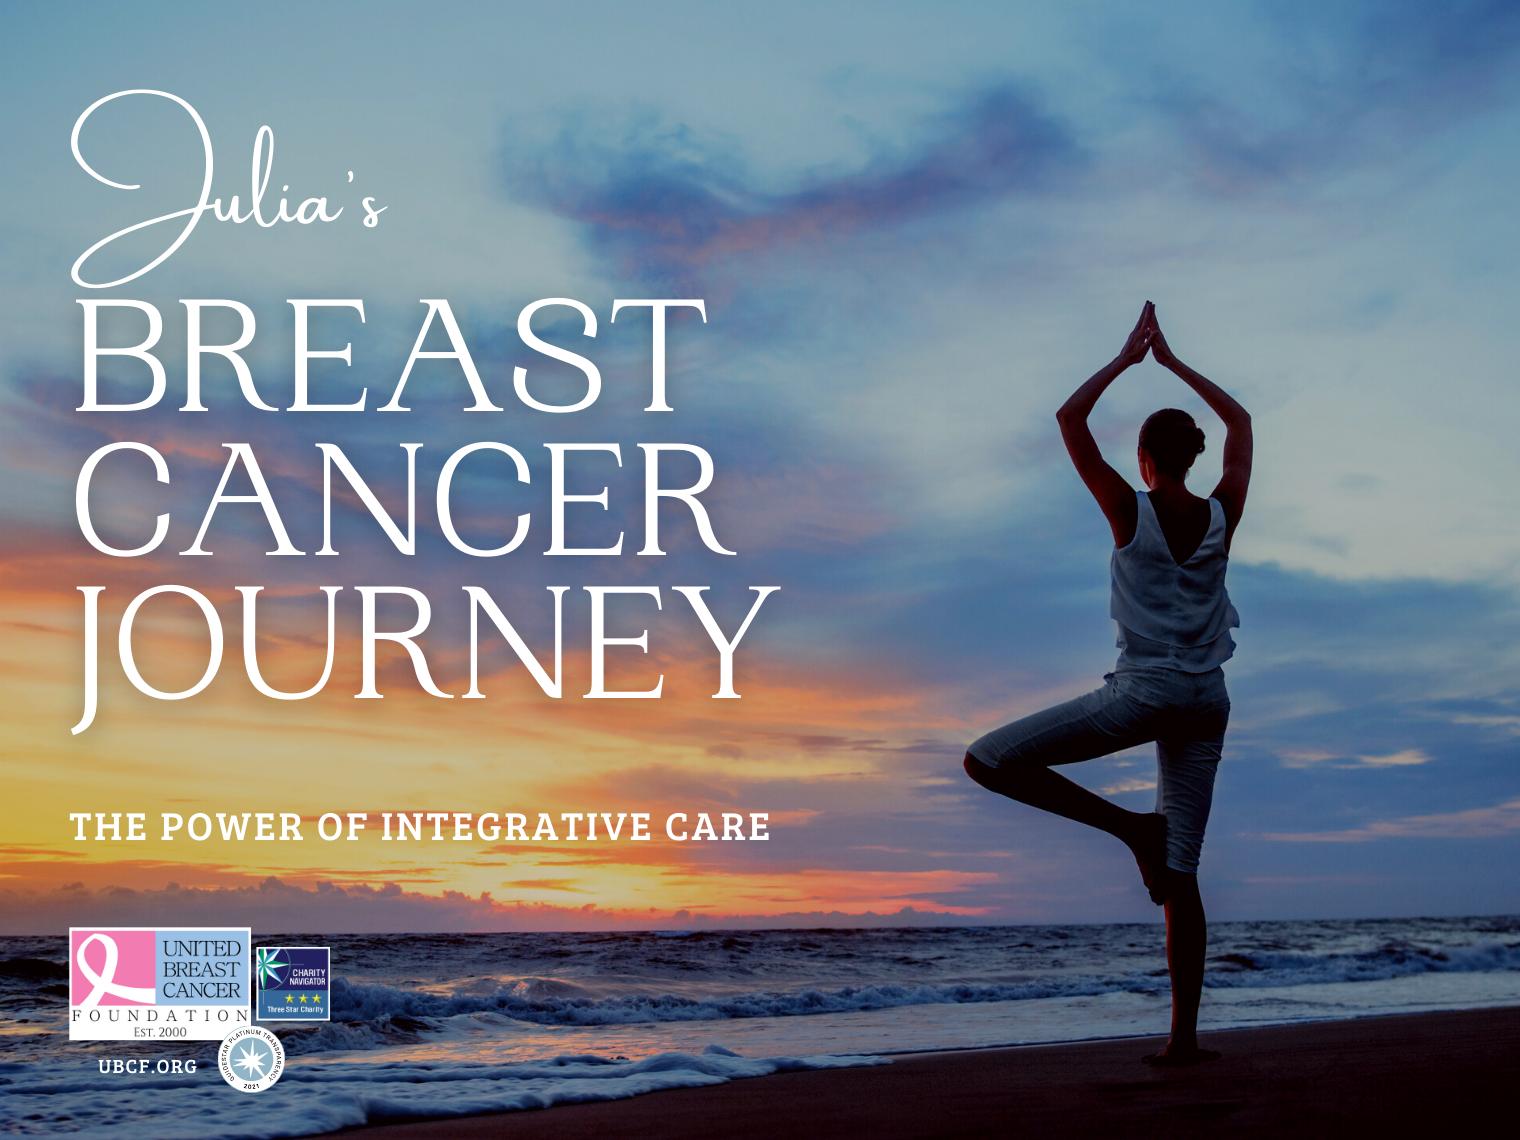 Julia's Journey- The Power of Integrative Care